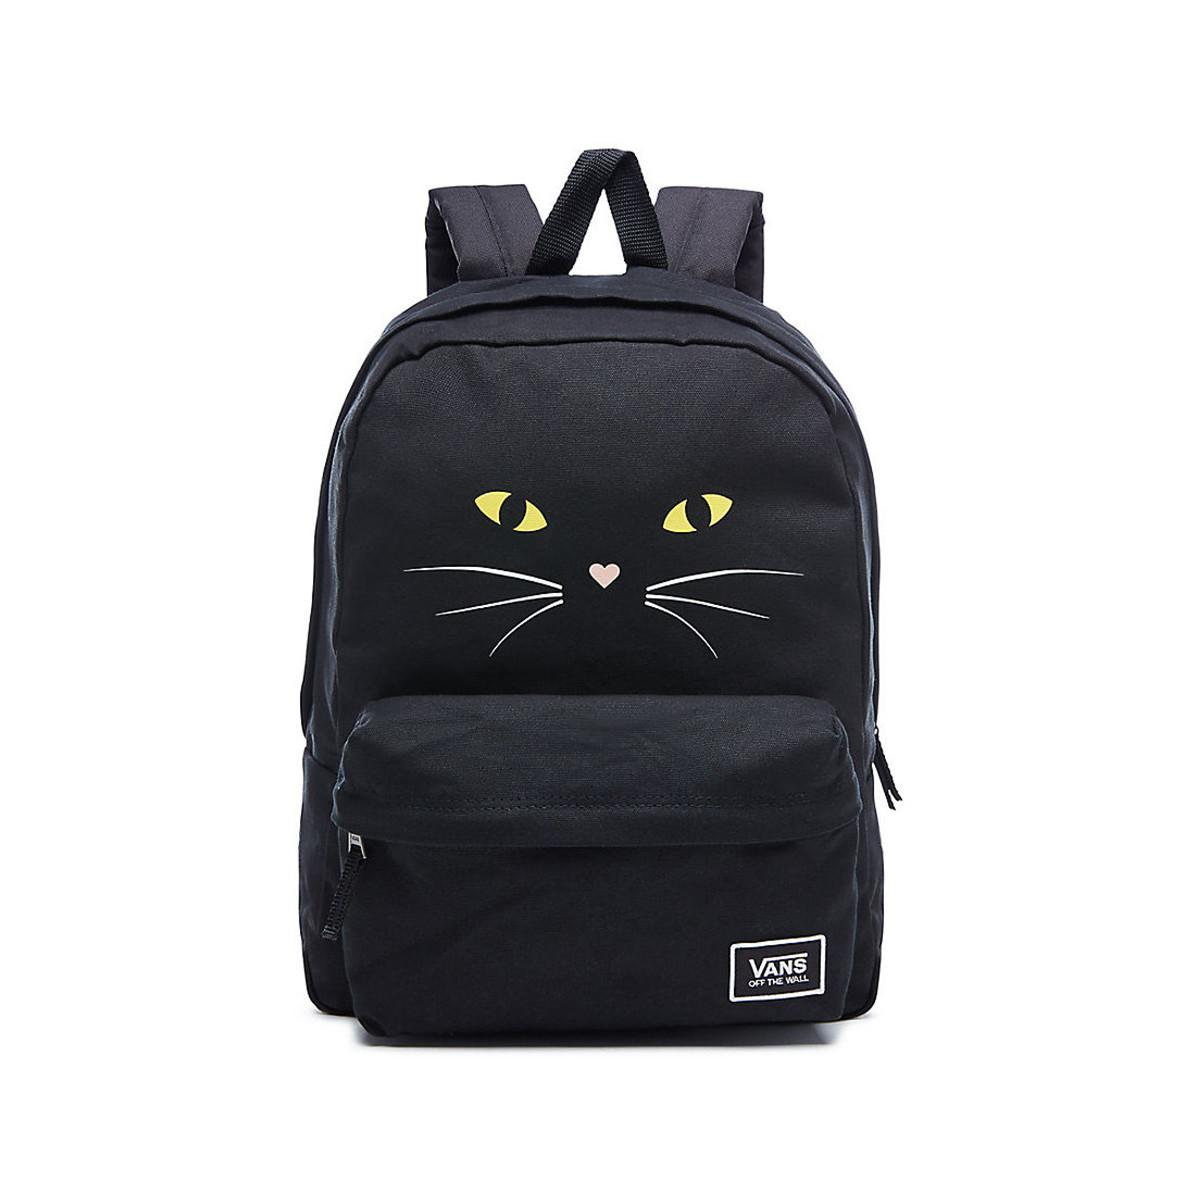 78499c30c8 Vans Realm Classic Backpack - Black Cat Women s Backpack In Black in ...